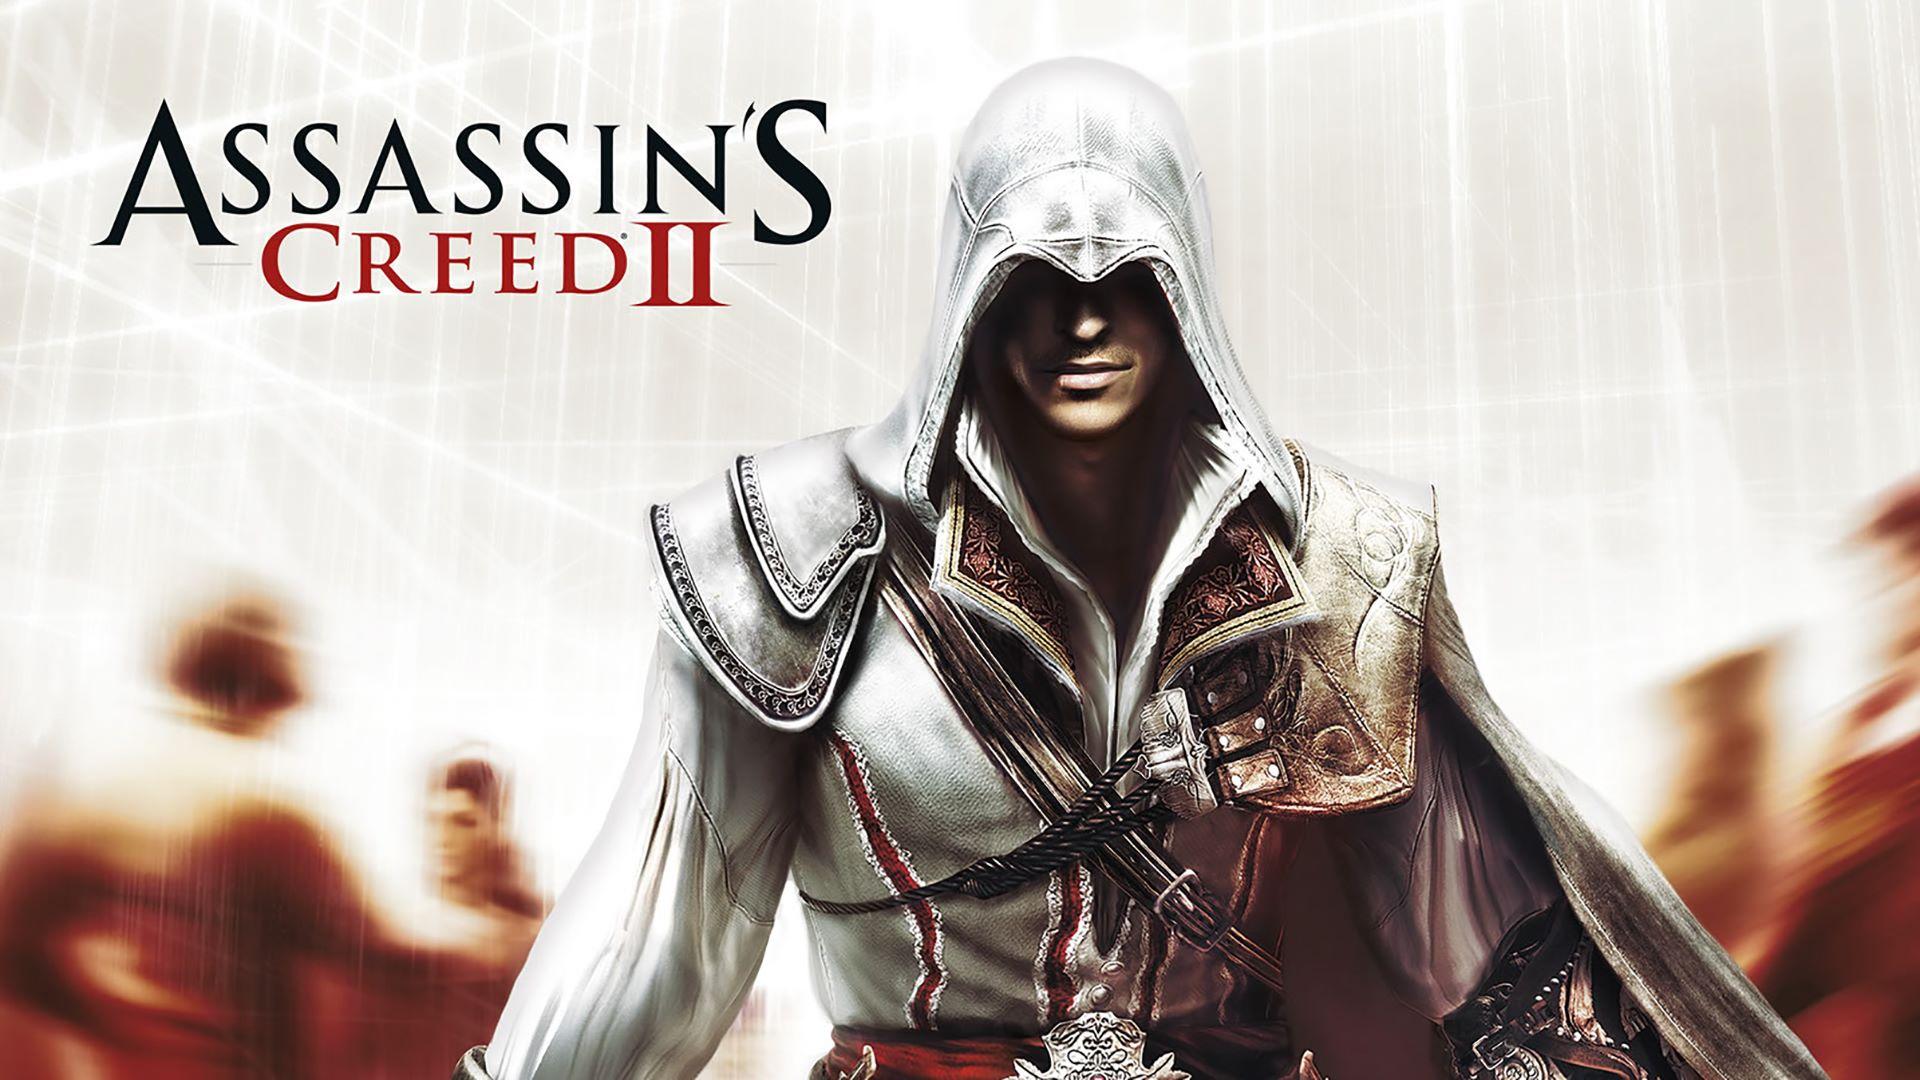 Jade Raymond était productrice exécutive sur Assassin's Creed 2